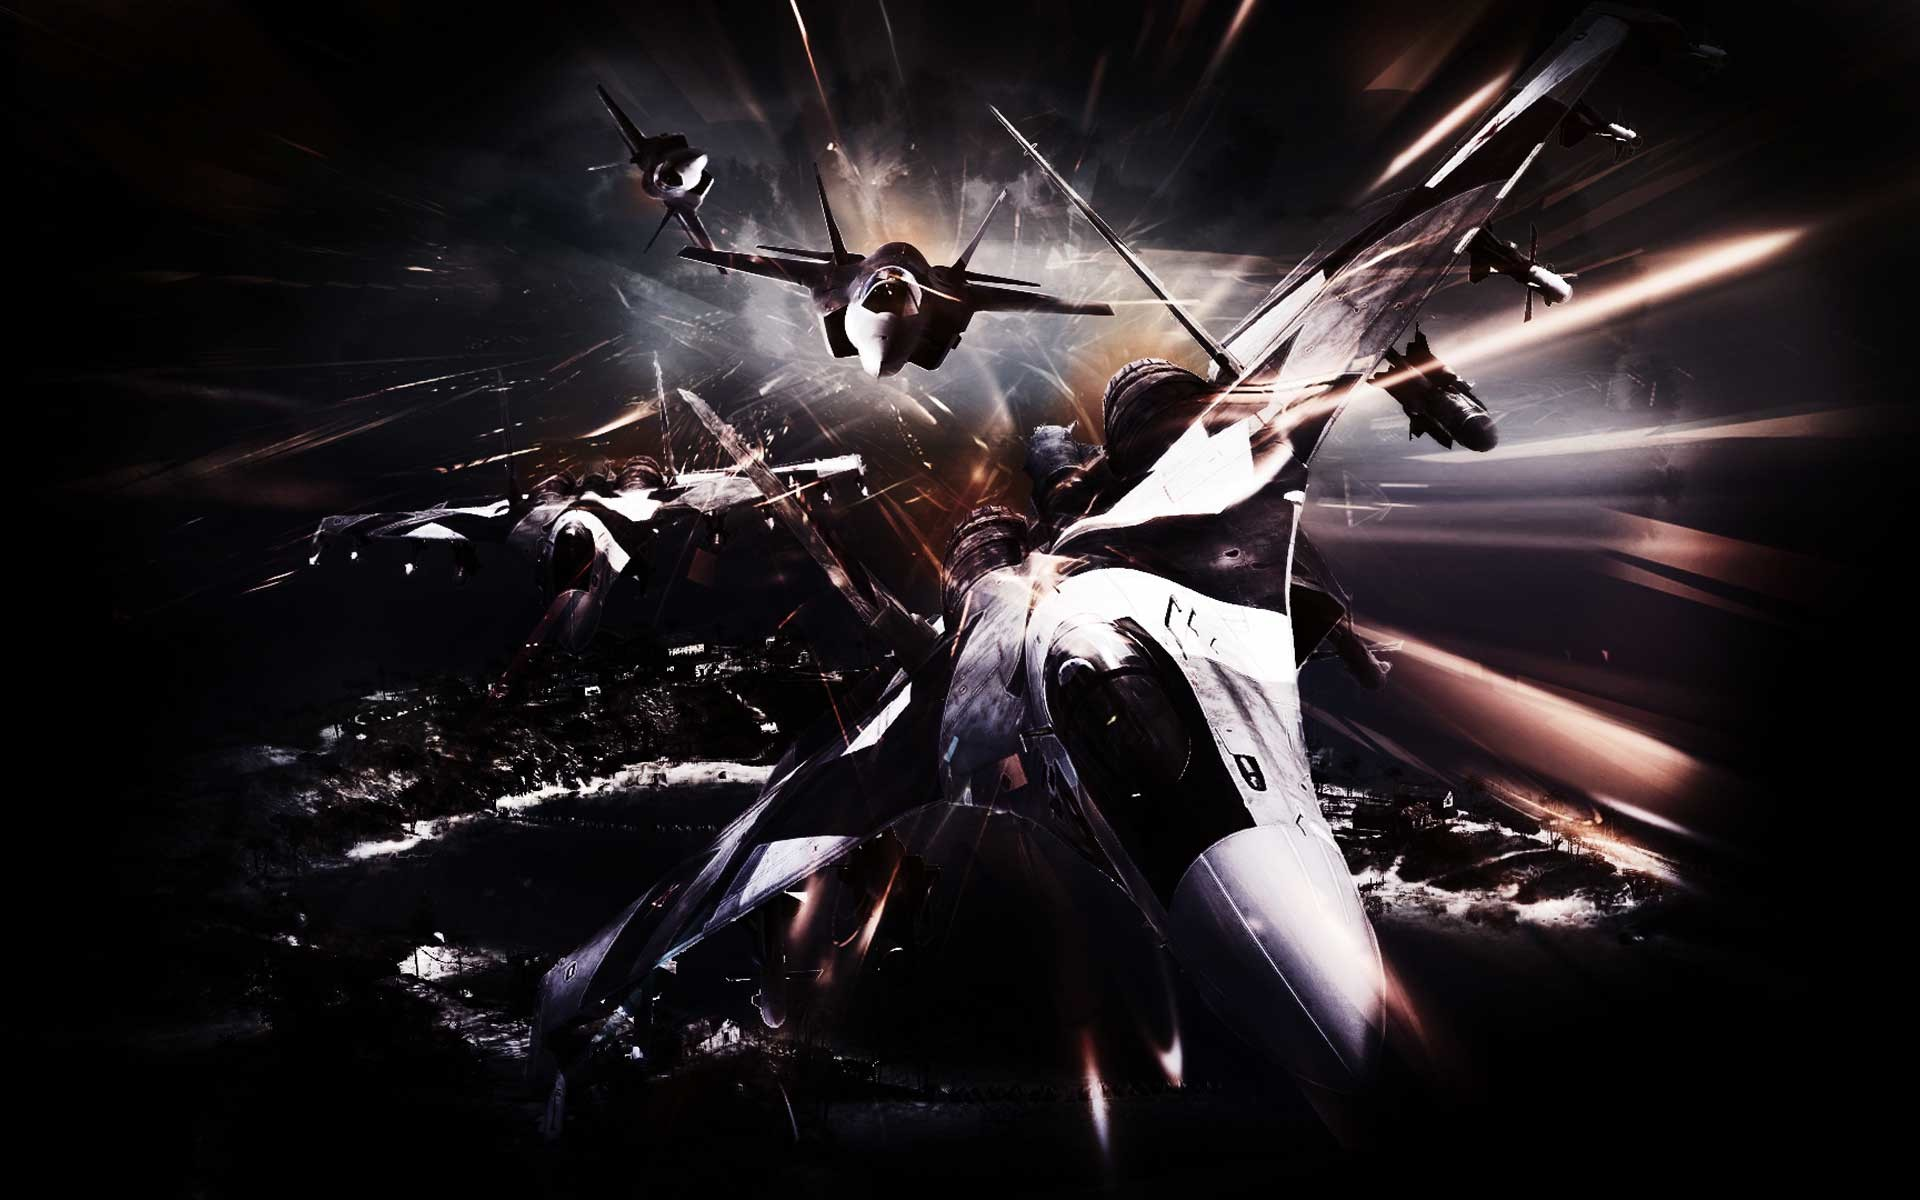 Free Battlefield 3 Jets 1440x900px High Definition Wallpaper Jets .